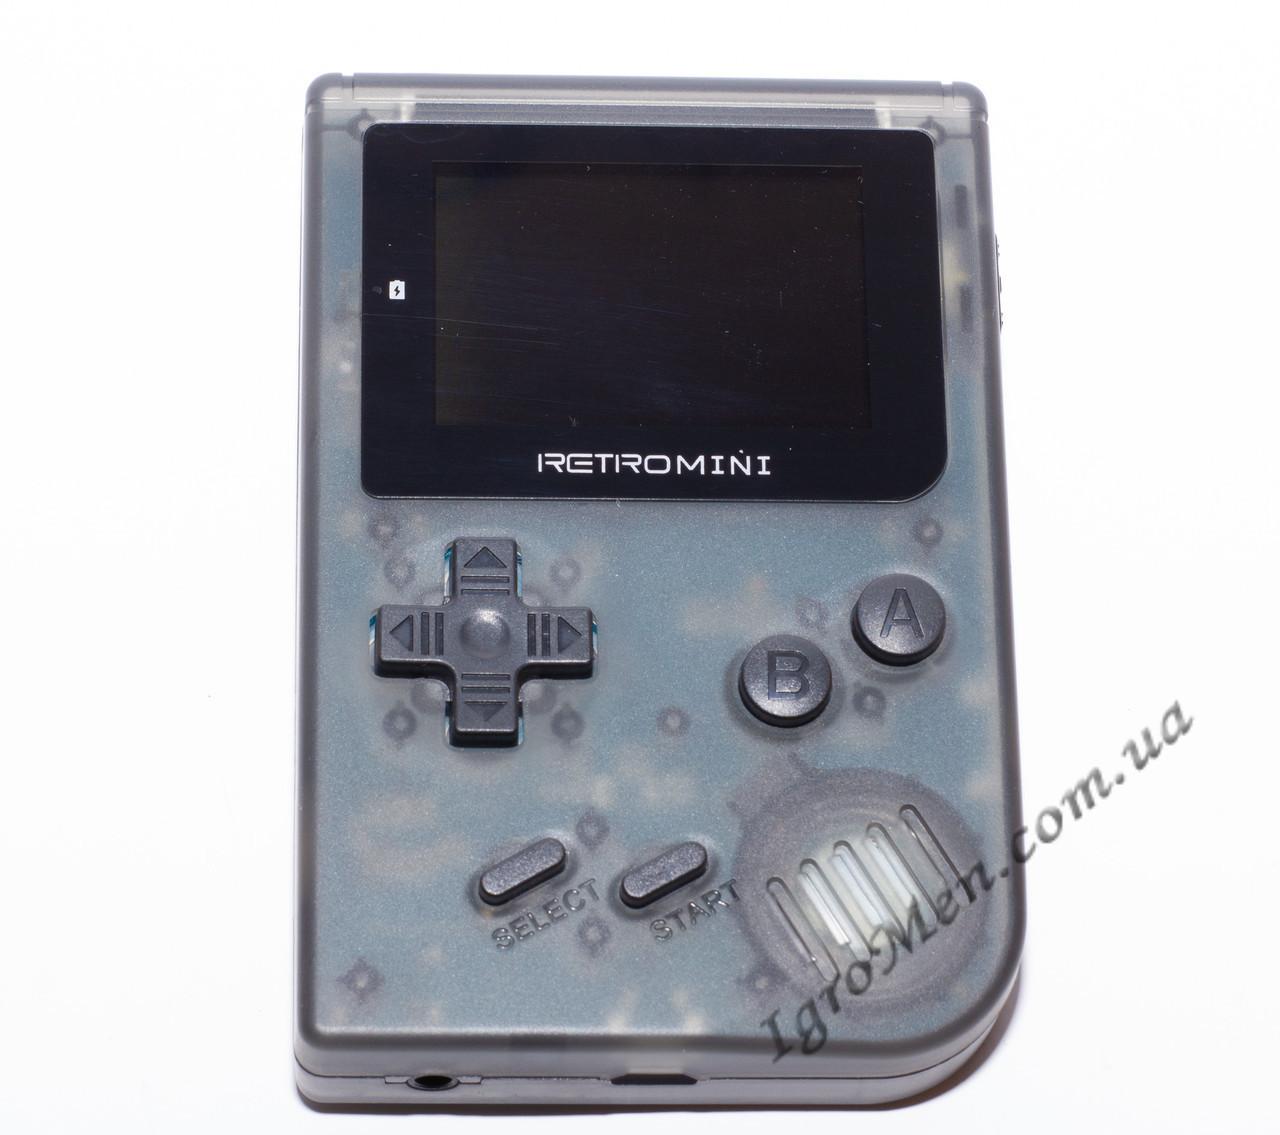 Портативна Nintendo Game Boy Color (Retro Mini, 169 ігор, GBA, NES, SNES, +SD, save)